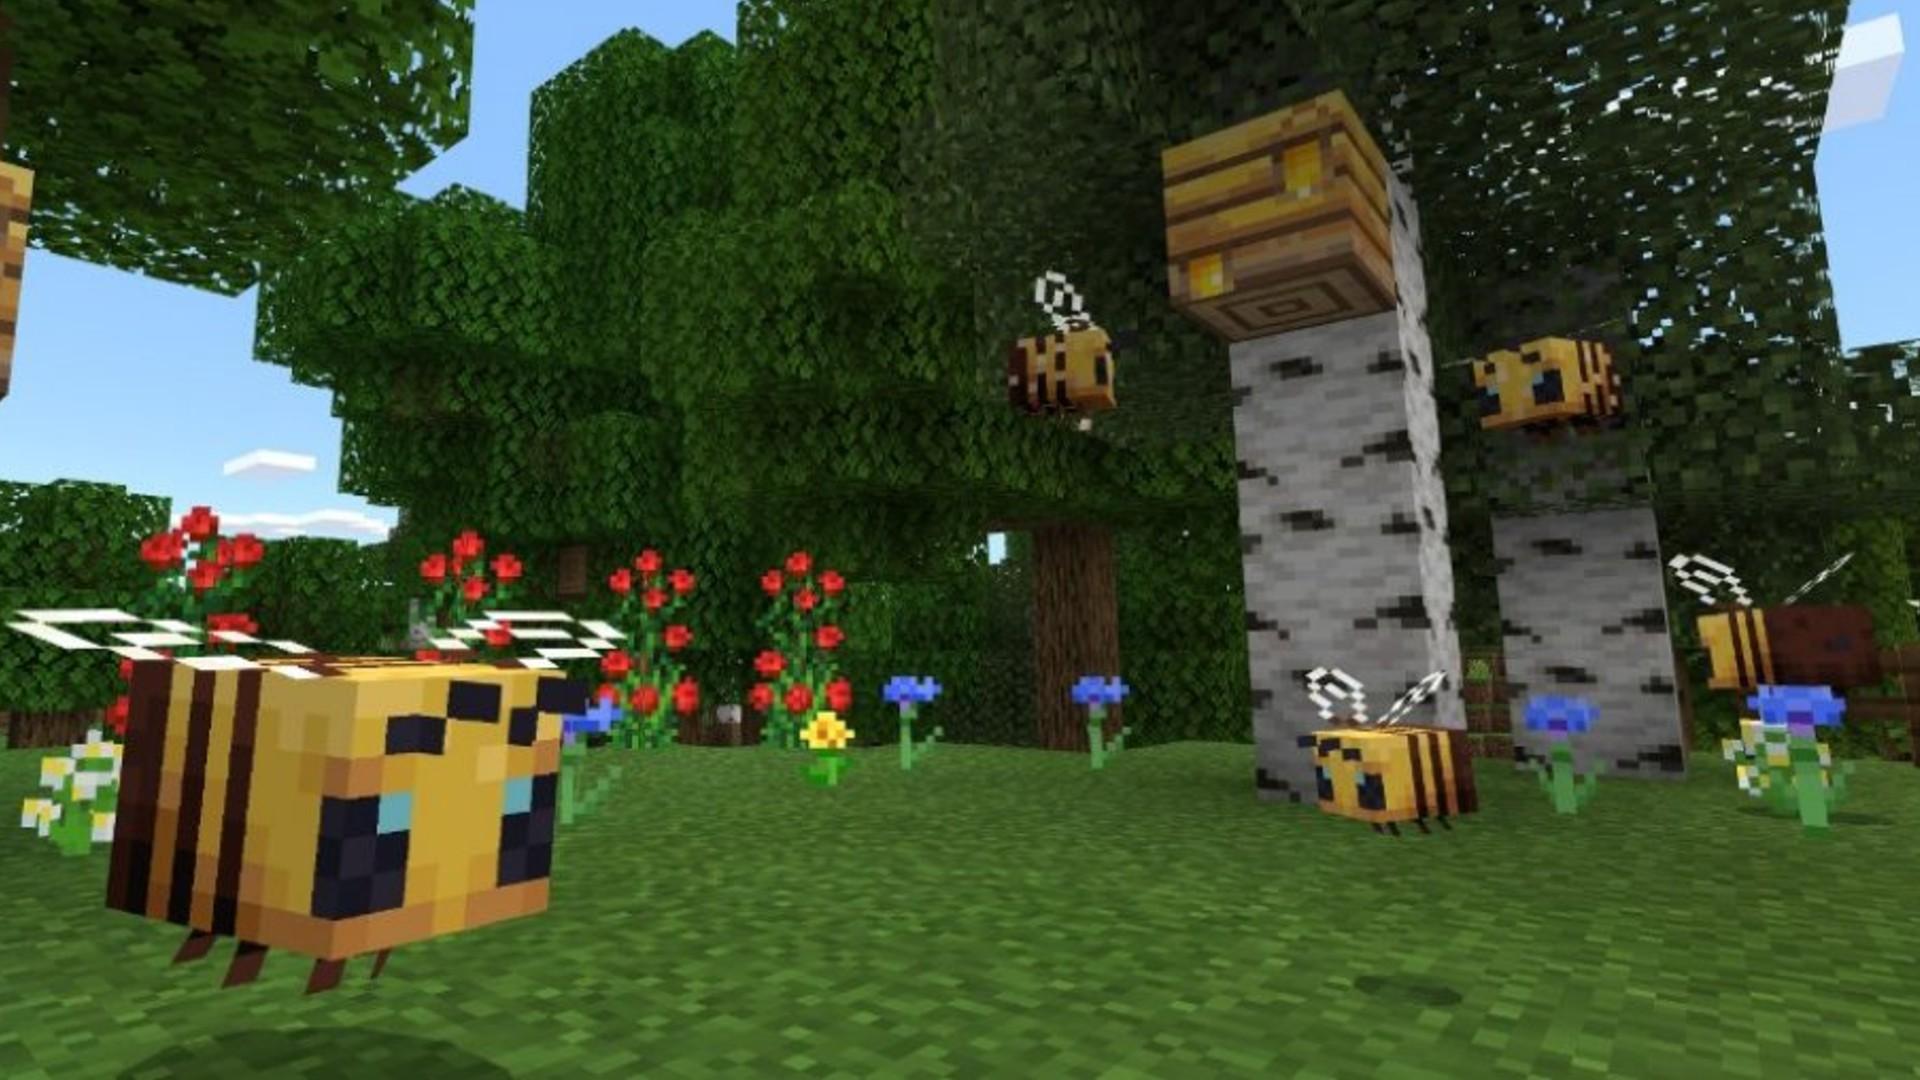 Minecraft farm ideas: layouts for farming in Minecraft